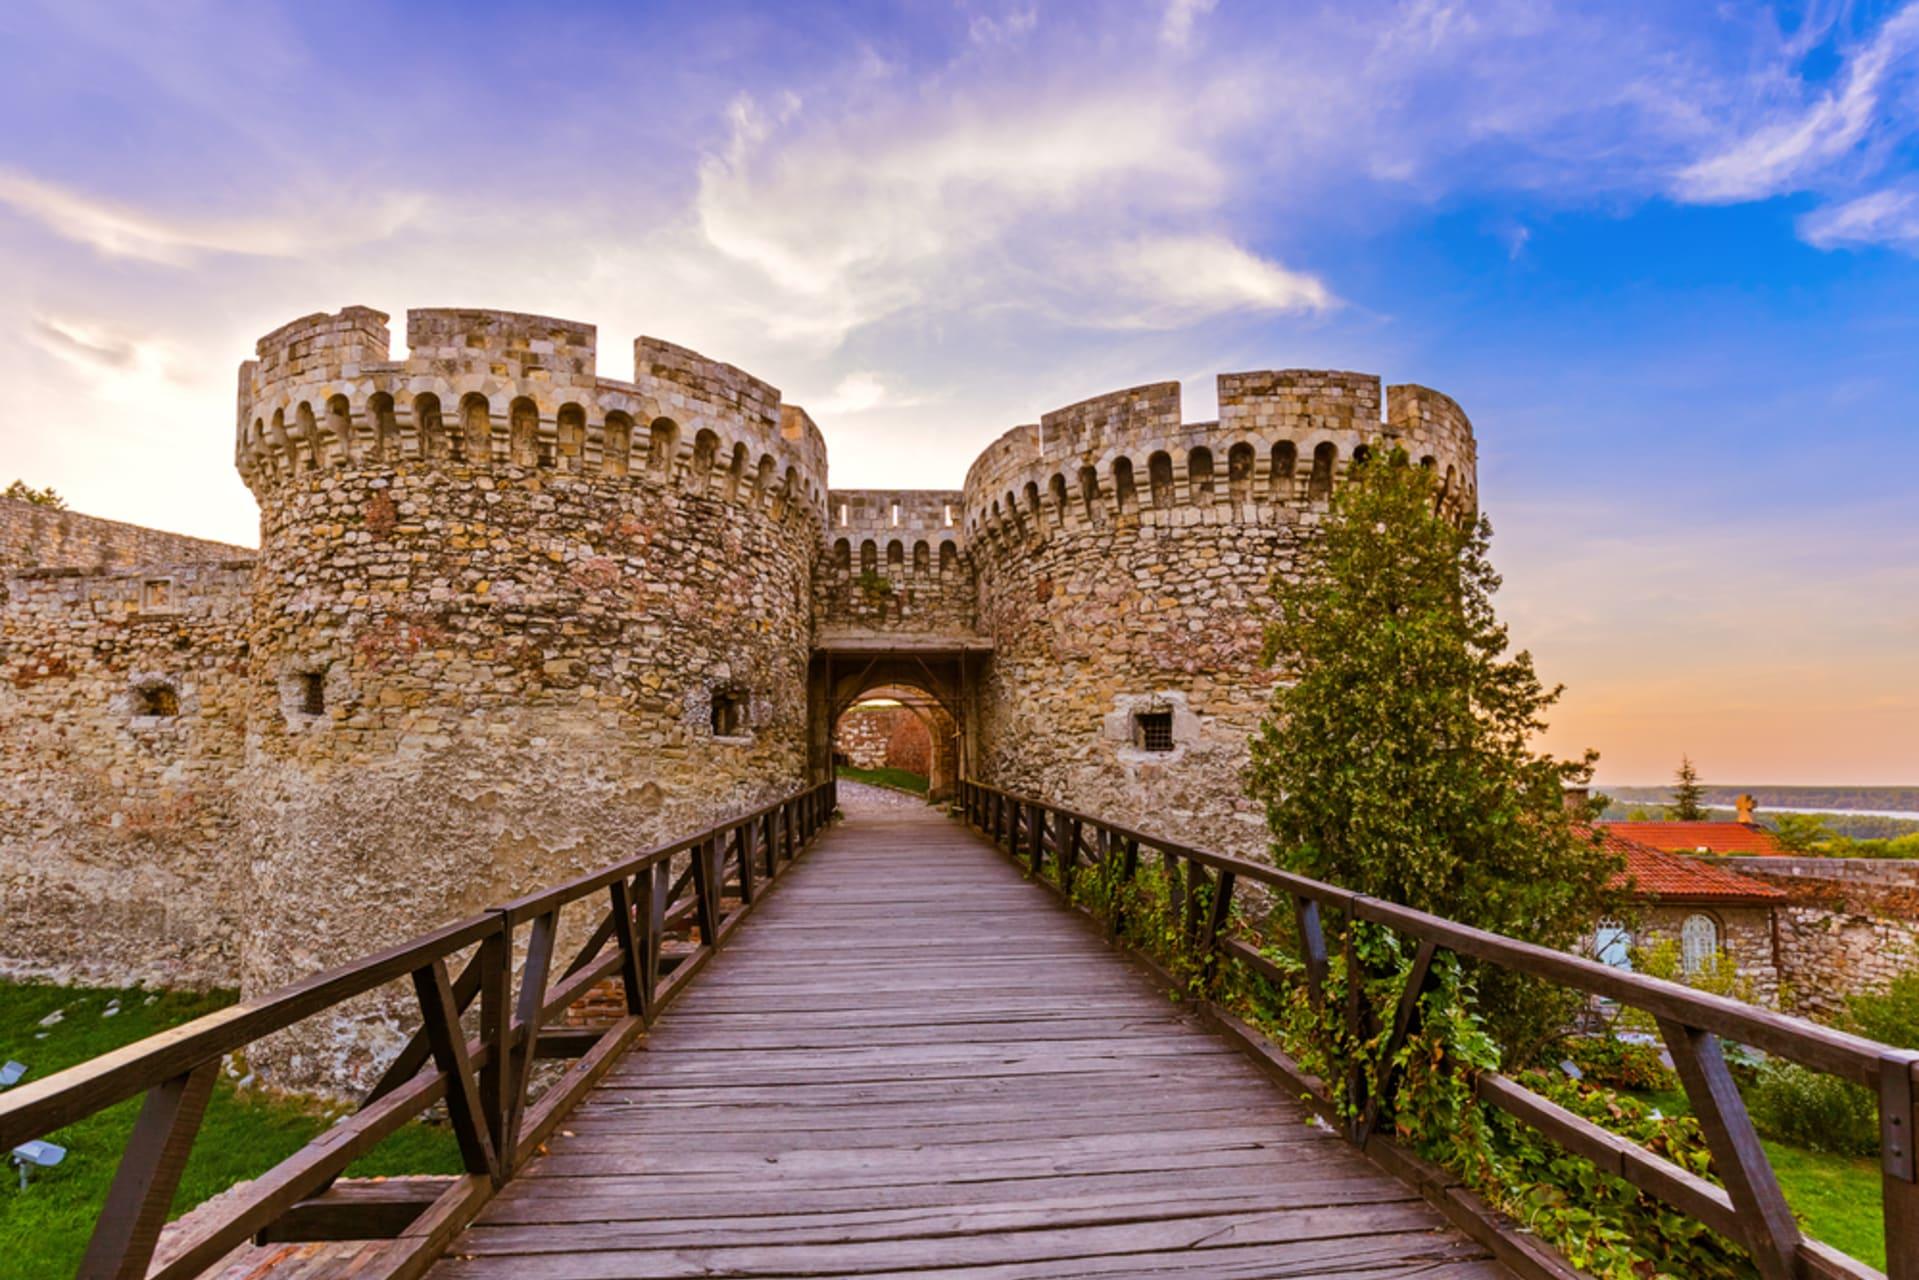 Belgrade - A Battlefield and a Hill For Contemplation: Discover Ancient Belgrade Fortress